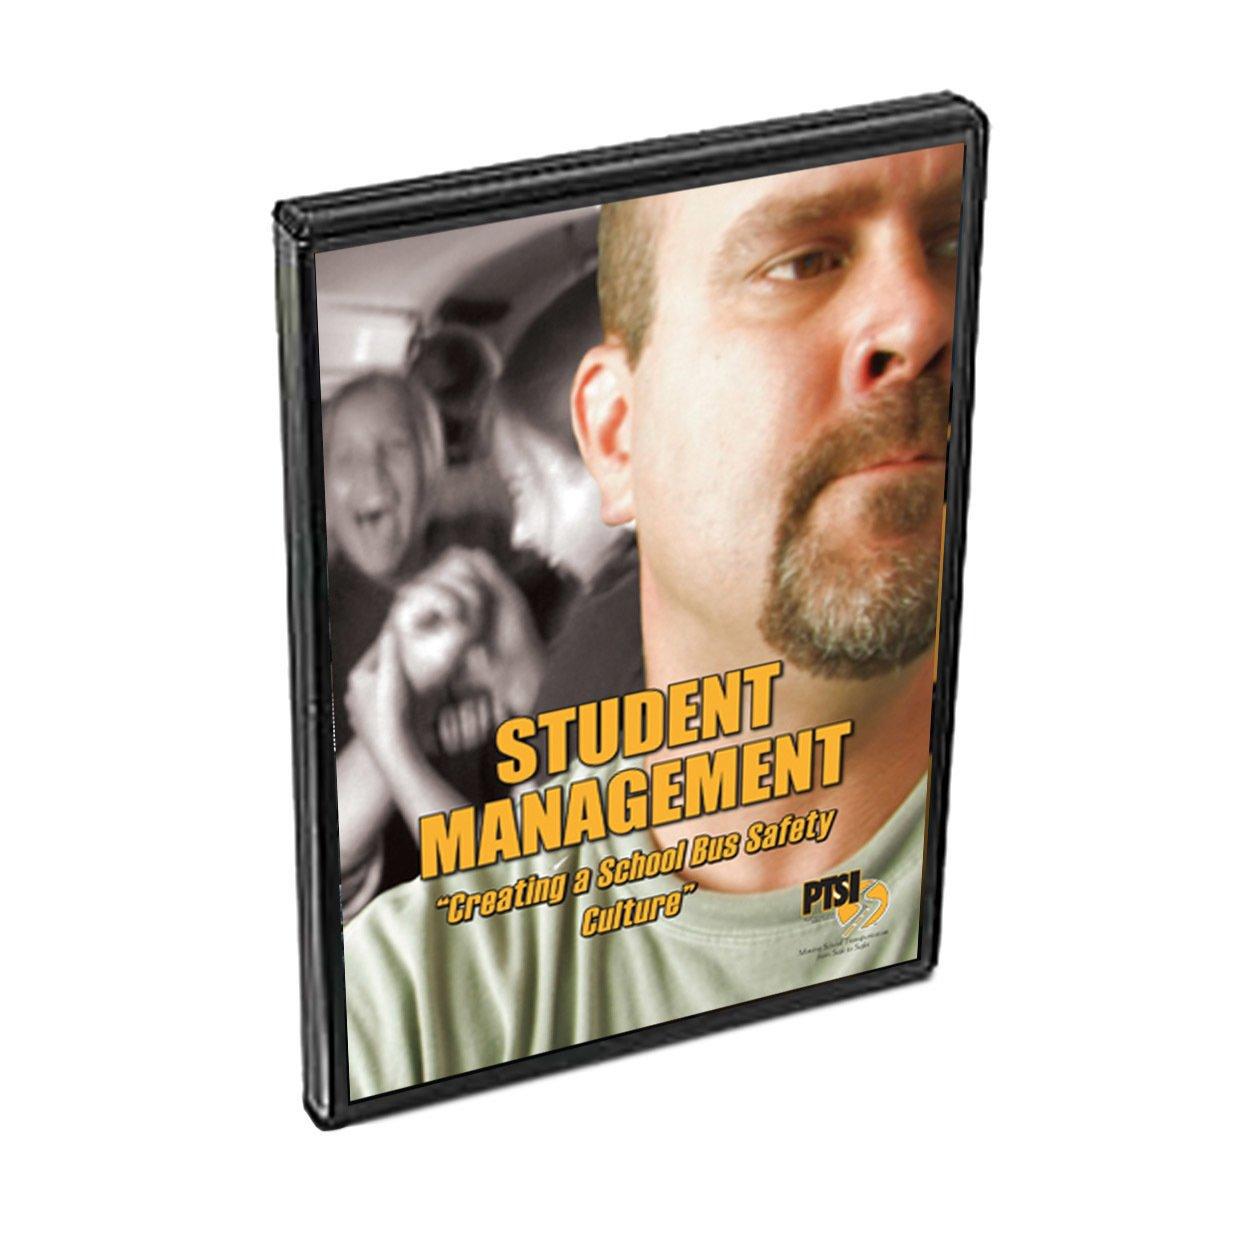 School bus management dvd comer